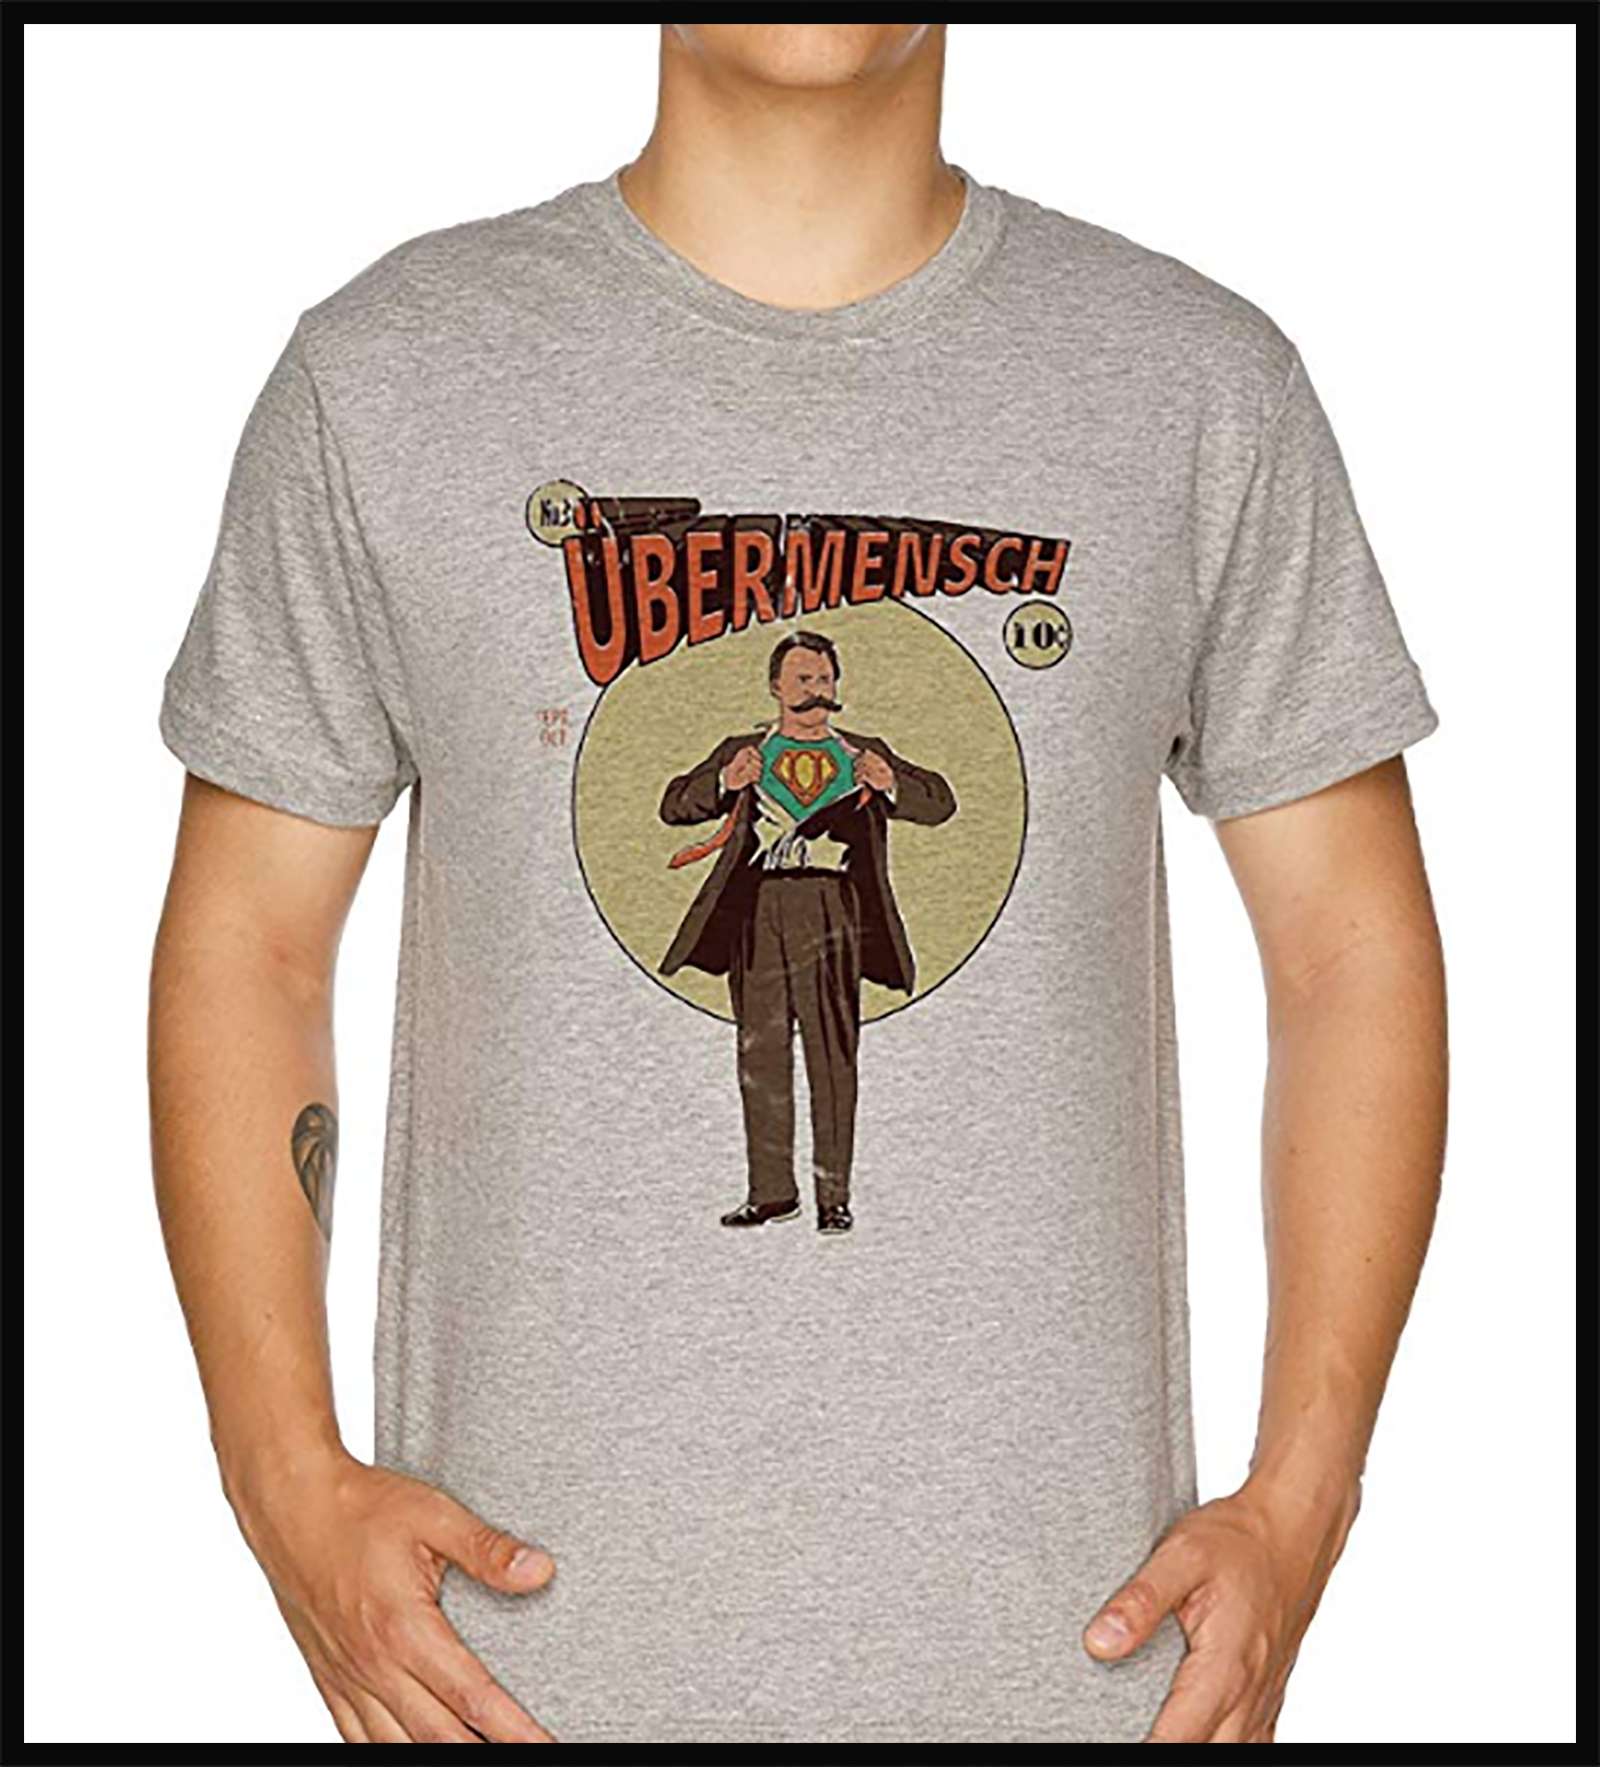 Ubermensch Surhomme Superman dpurb site web